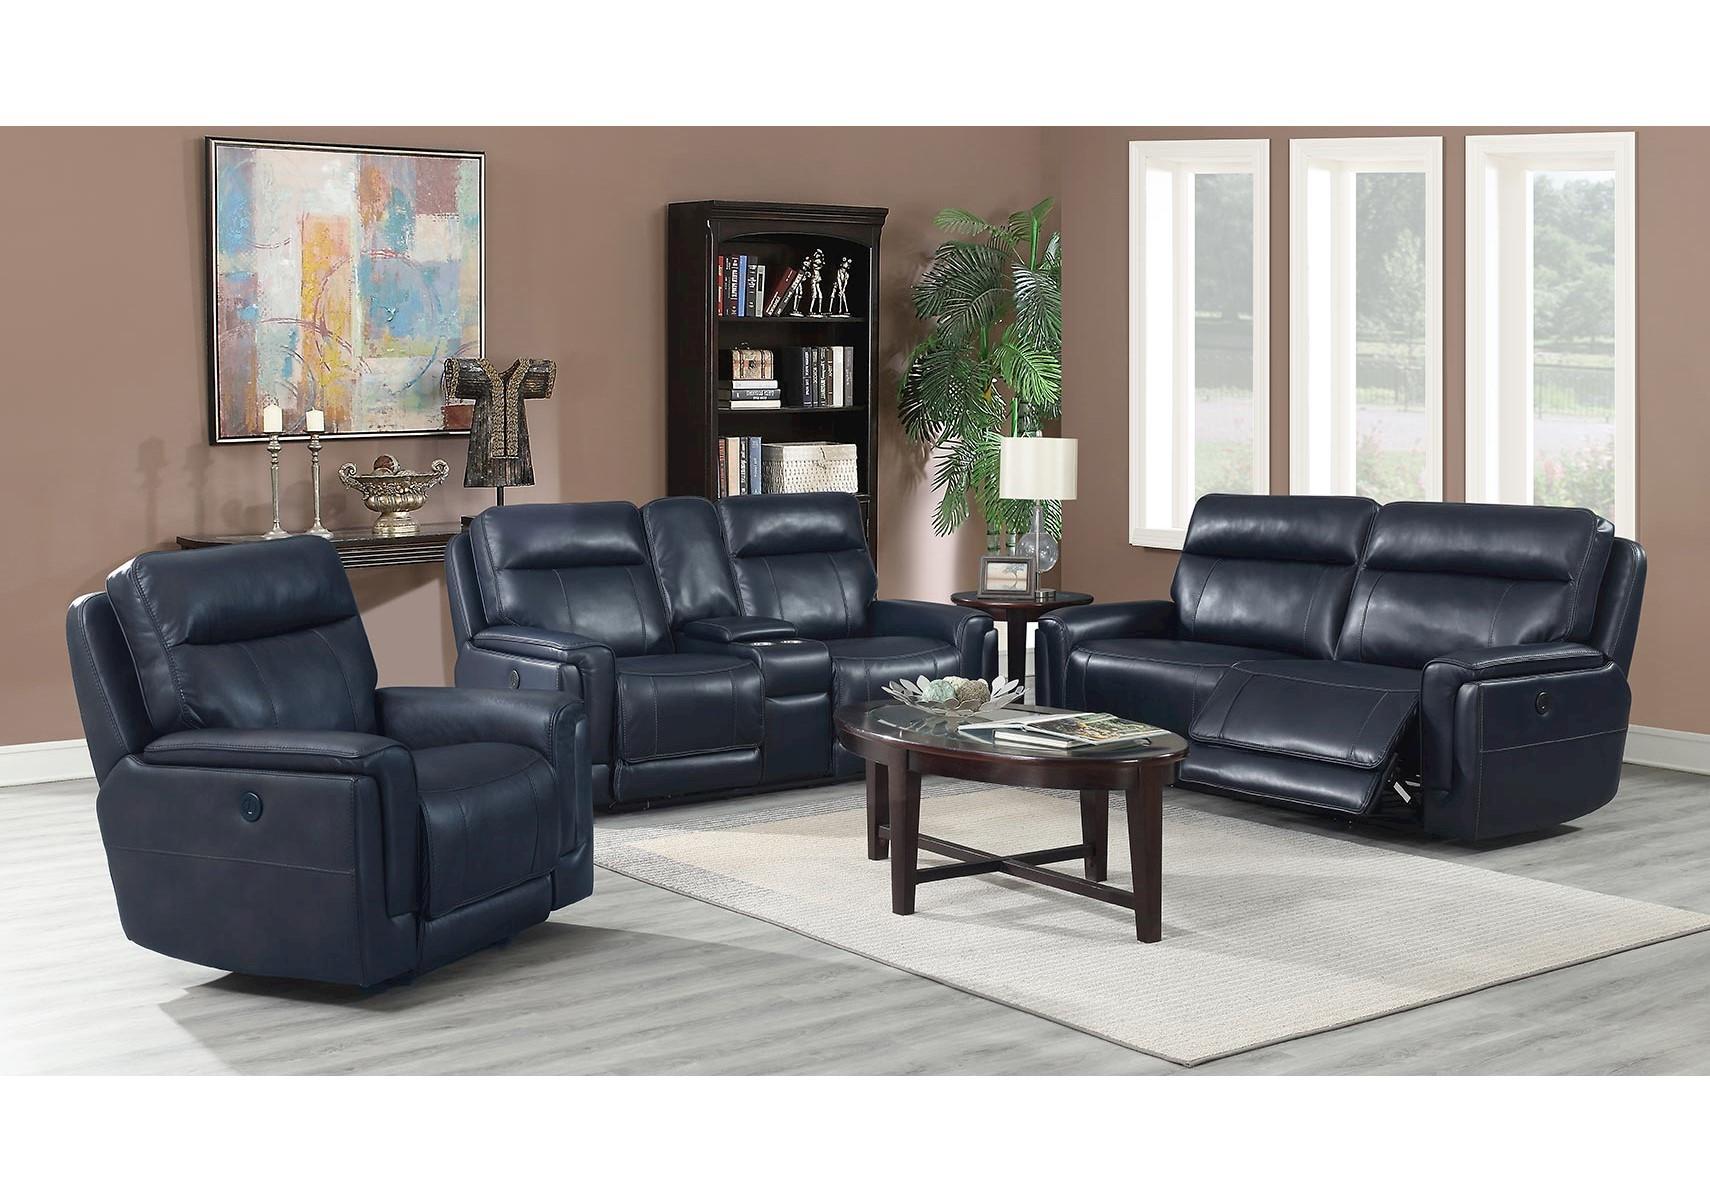 Image of: Lacks Terenti Blue 2 Pc Power Reclining Living Room Set